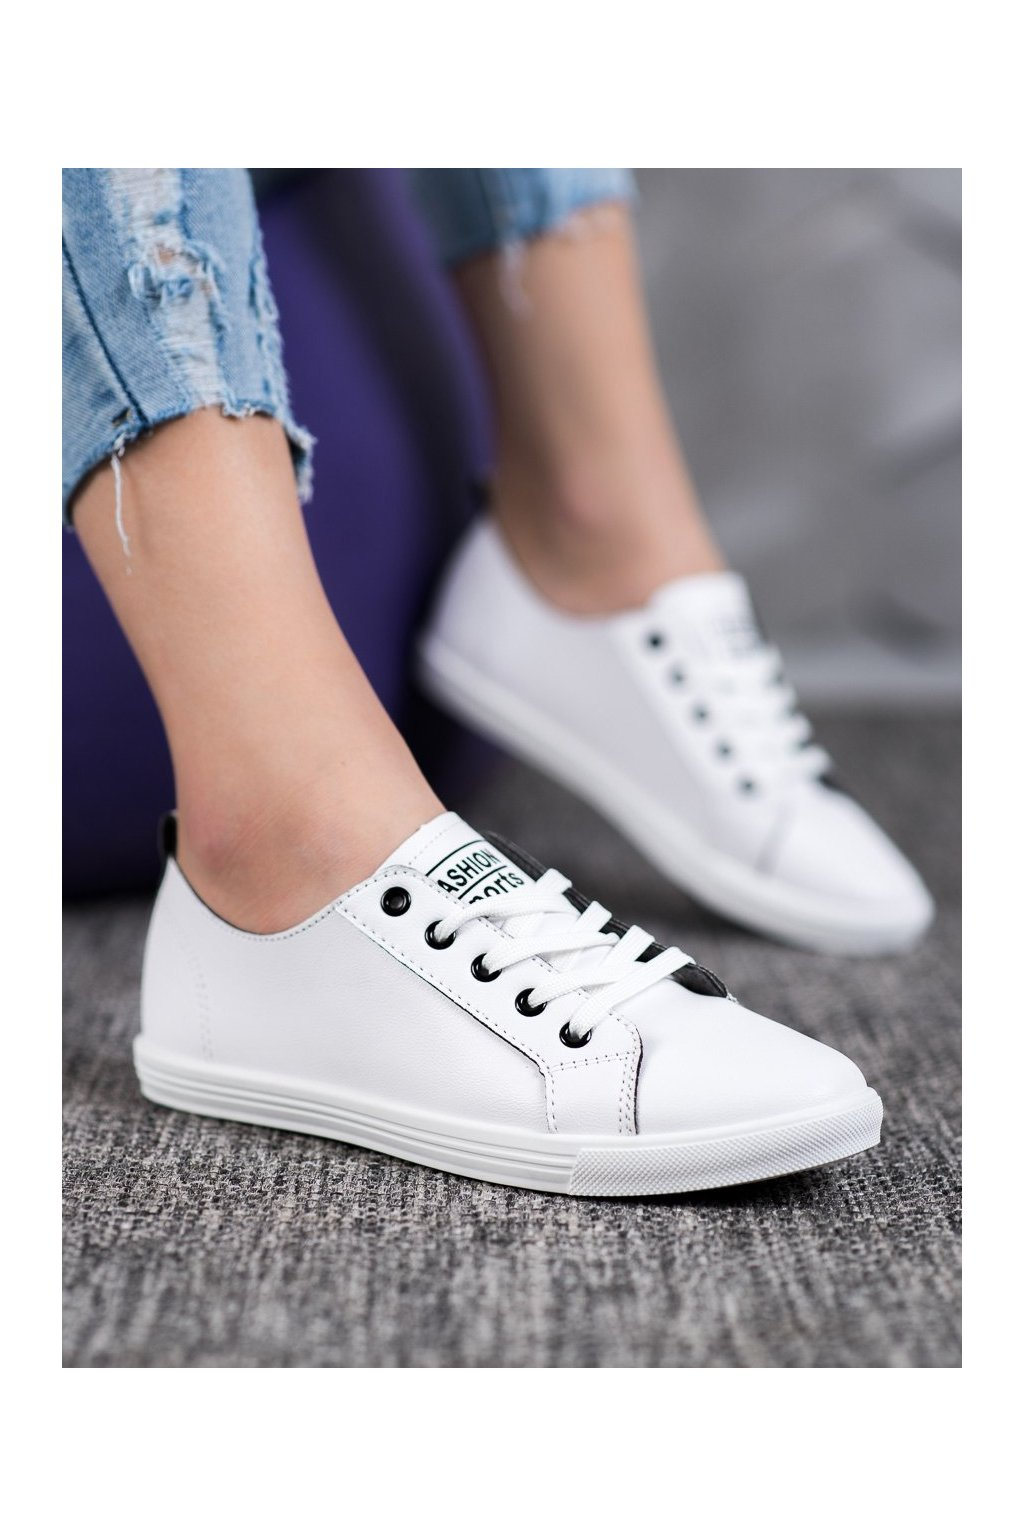 Biele tenisky Ideal shoes kod LX-9859W/B